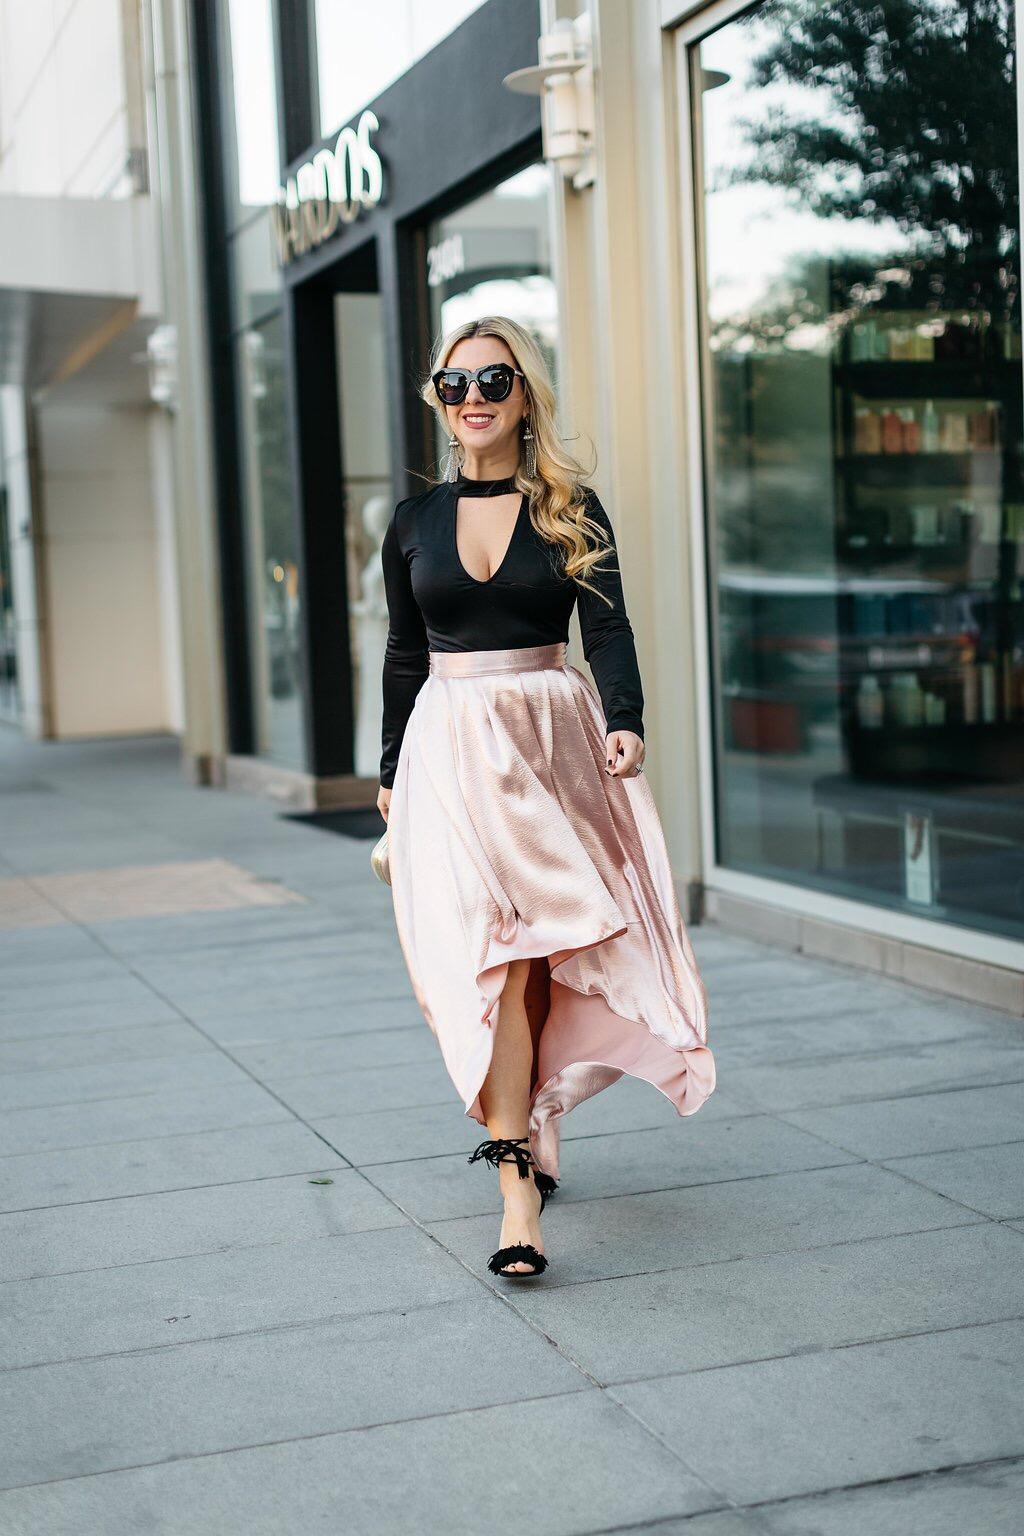 Pink Pleated Skirt | The Darling Petite Diva | Nicole Kirk